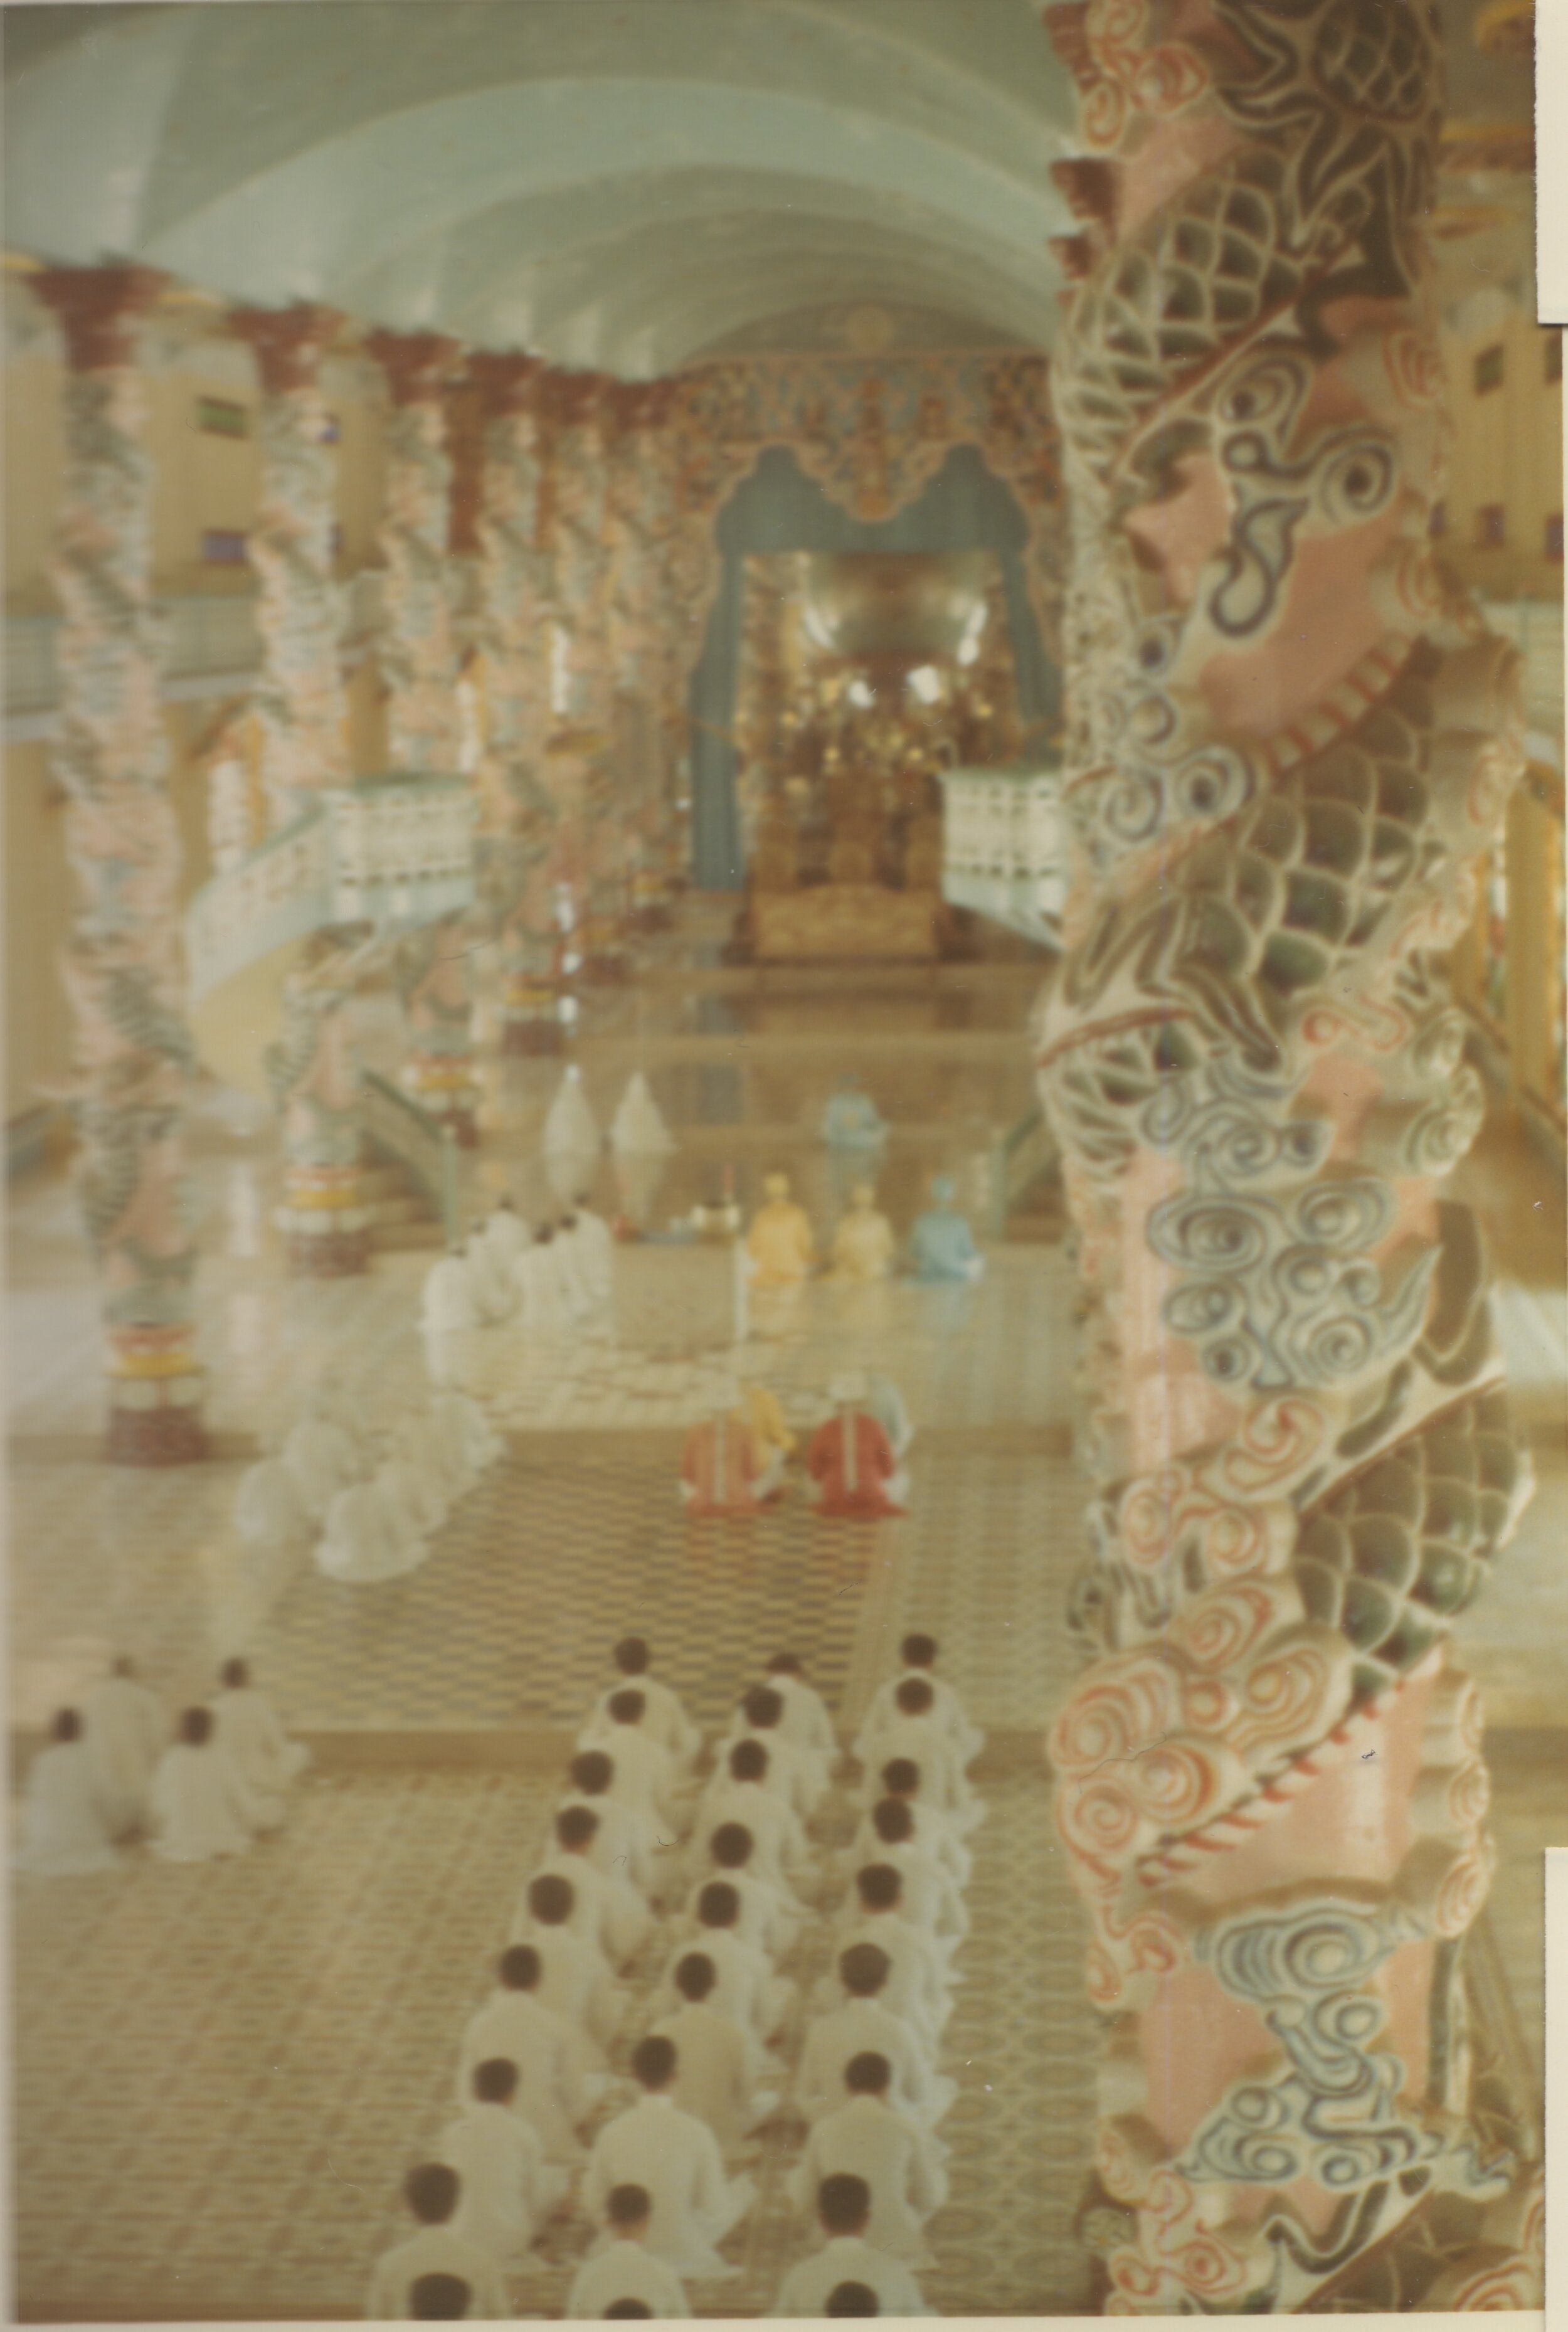 VN Inside Cao Dai temple .jpeg